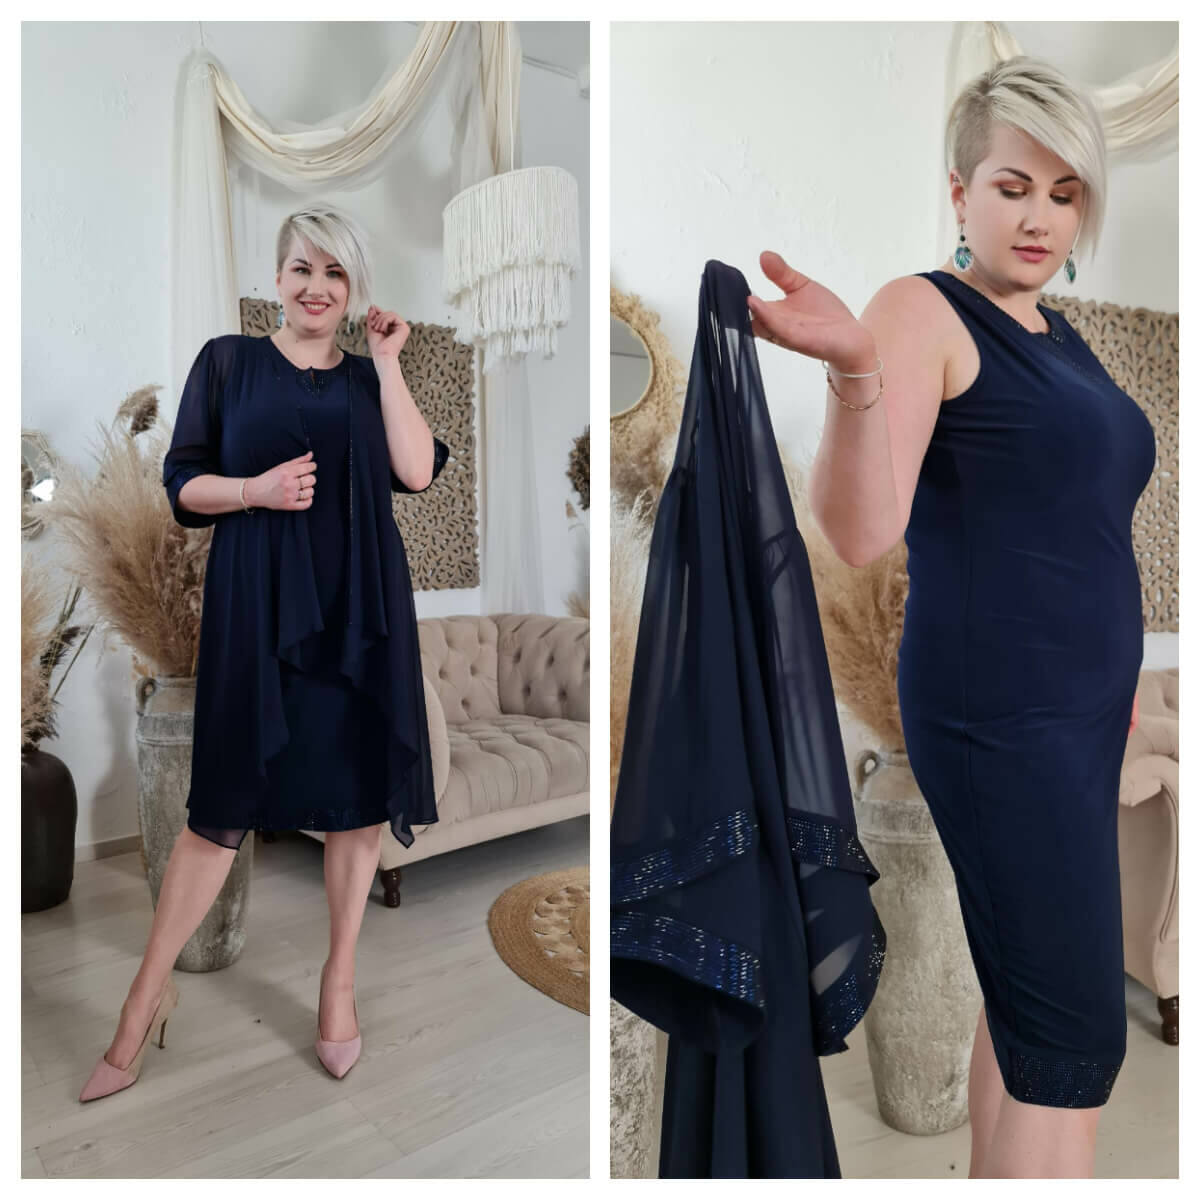 Danuta ruha - molett örömanya és alkalmi ruha